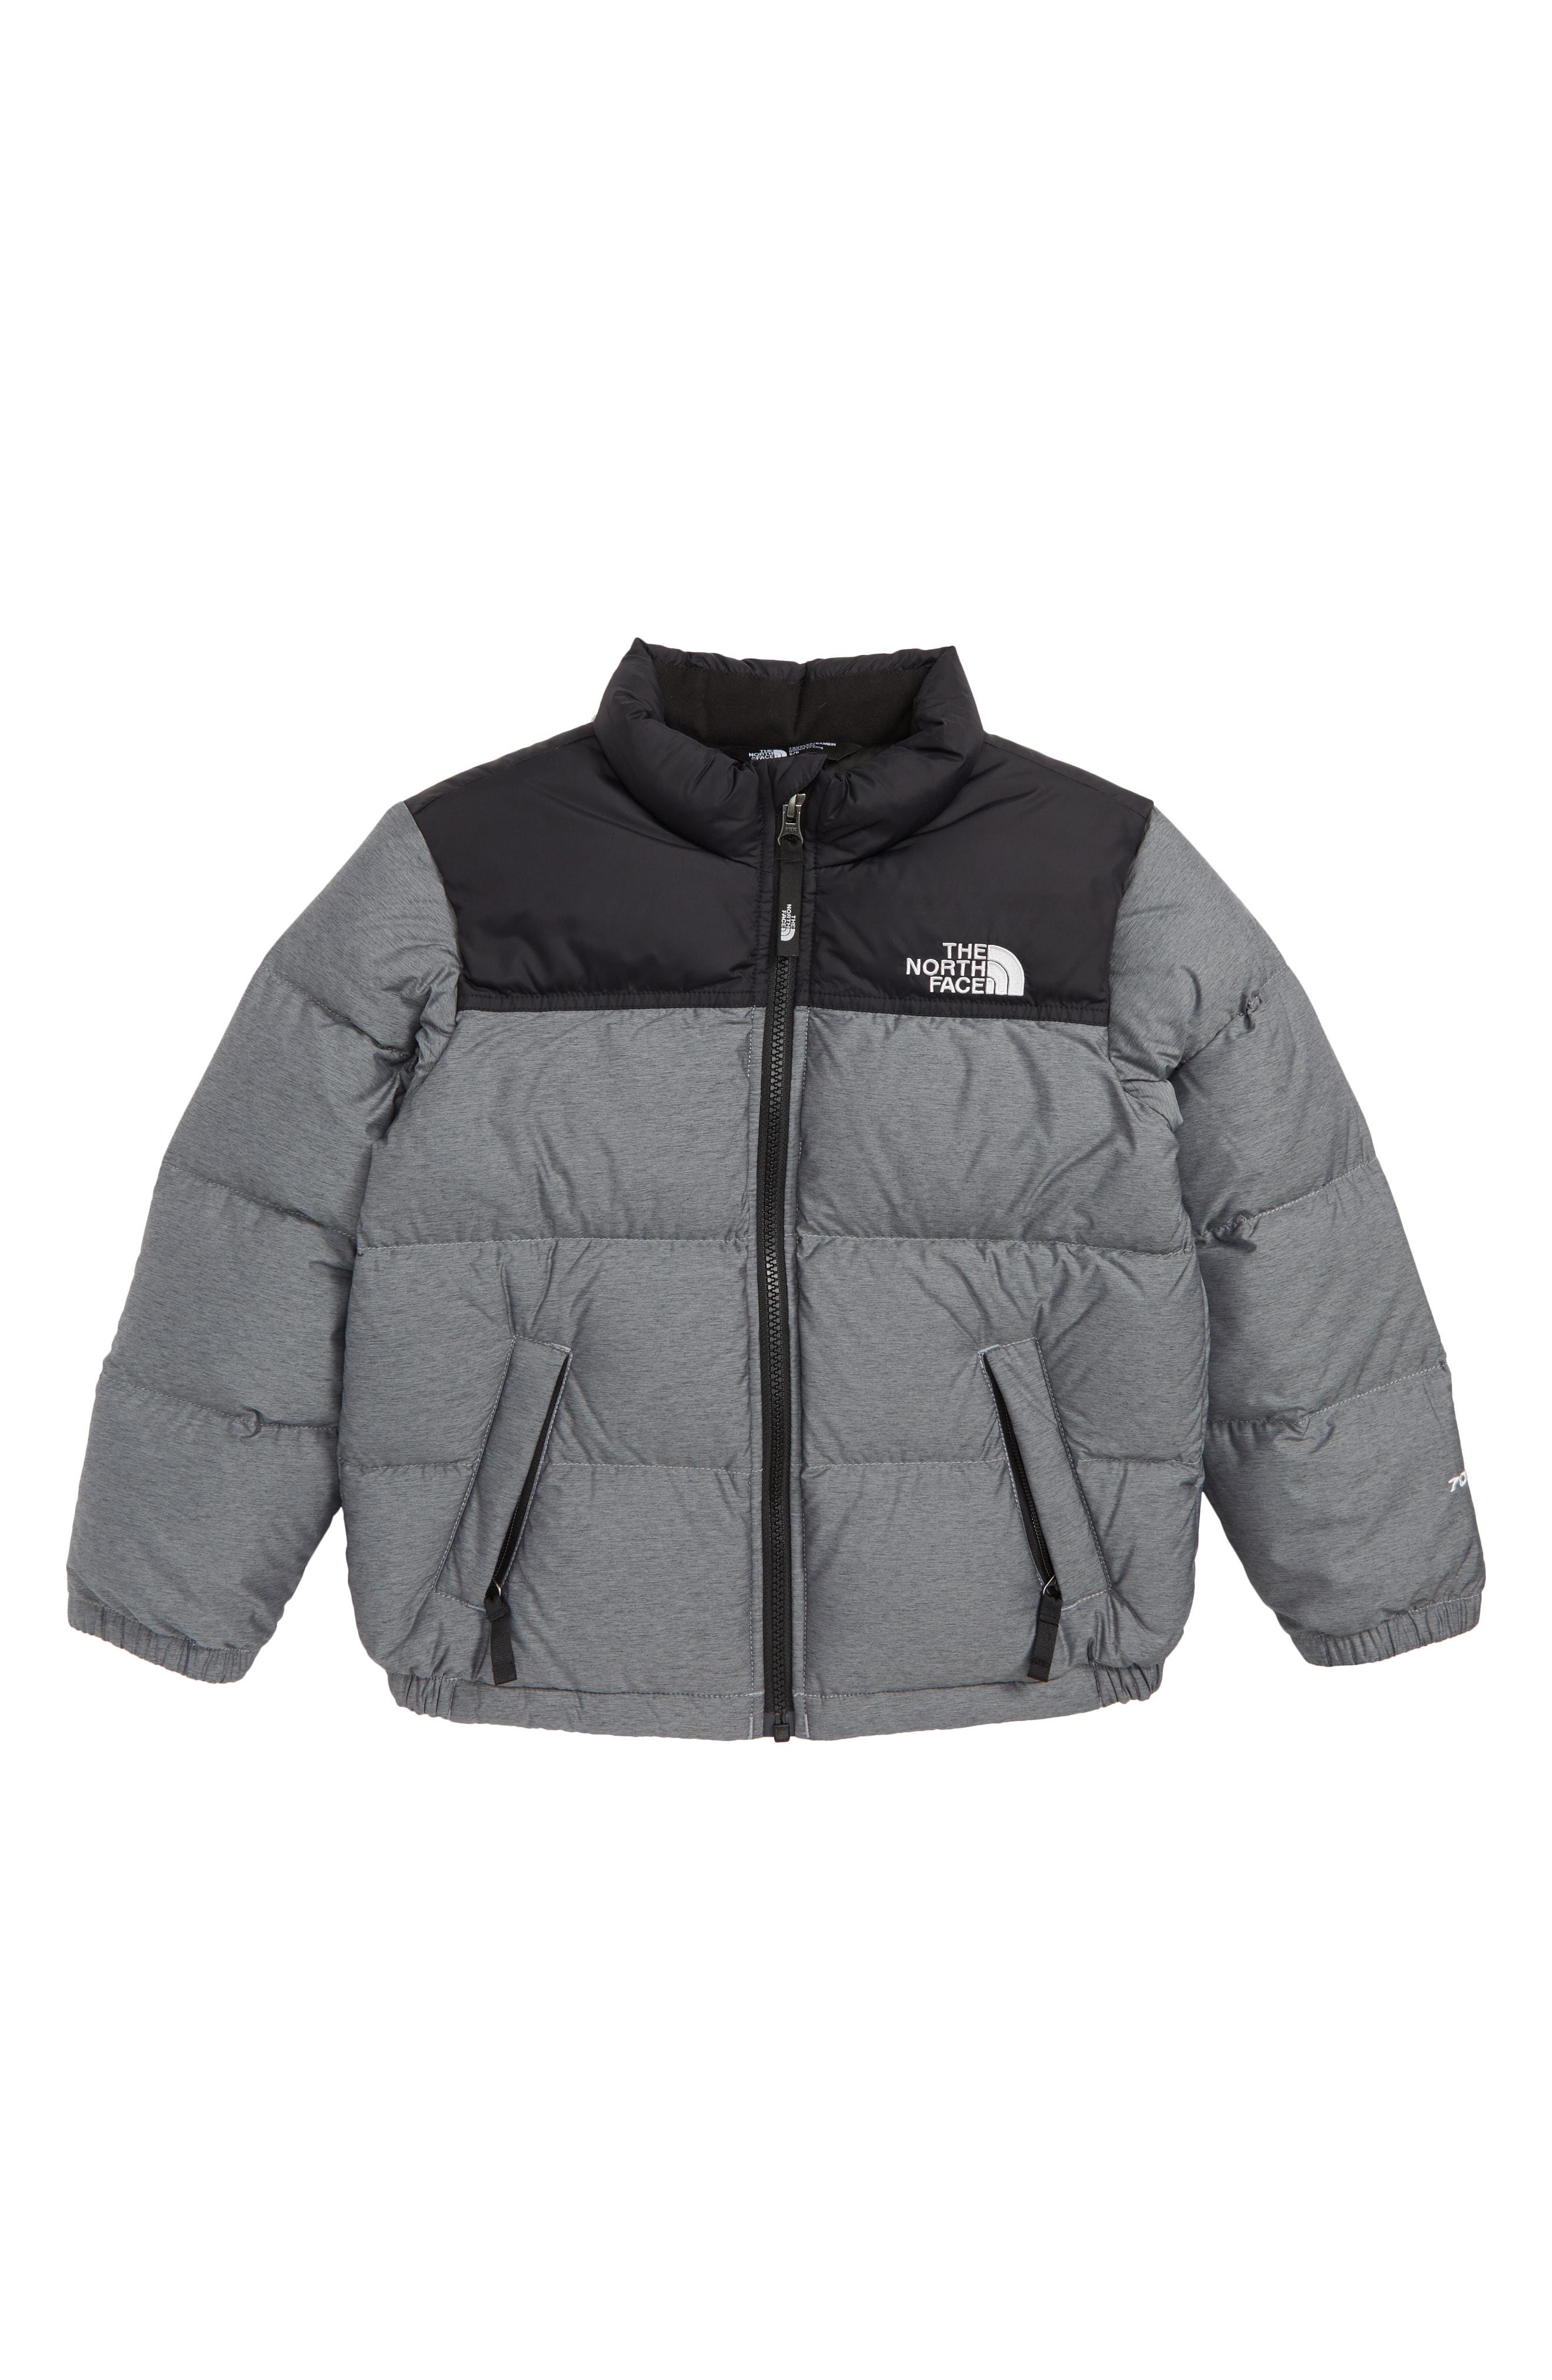 Boys' Coats, Jackets & Outerwear: Fleece & Parka   Nordstrom